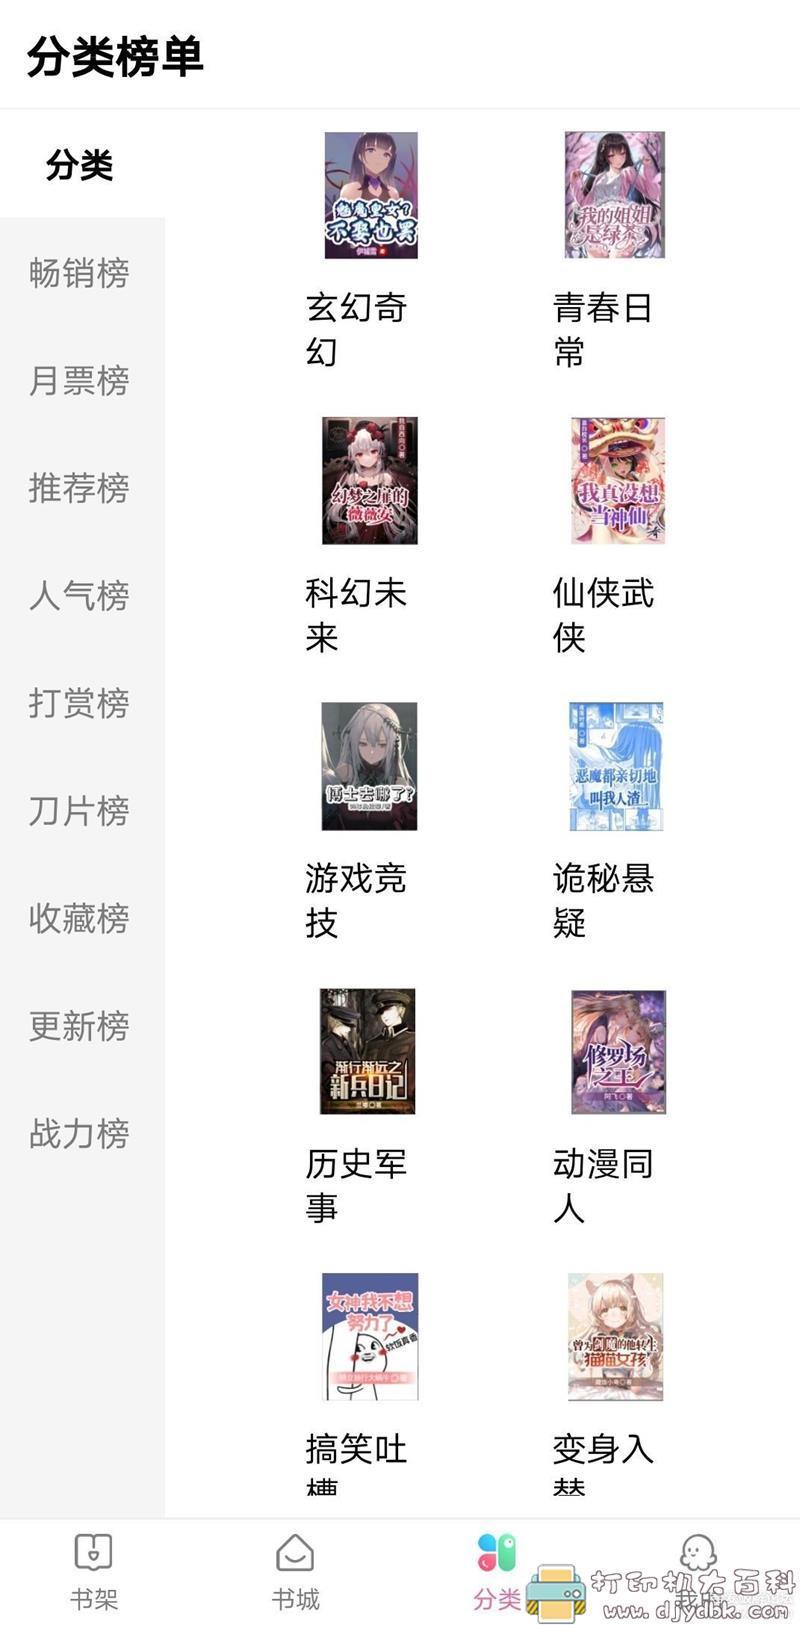 [Android]免费看小说:次元姬小说1.1.1最新版 配图 No.2